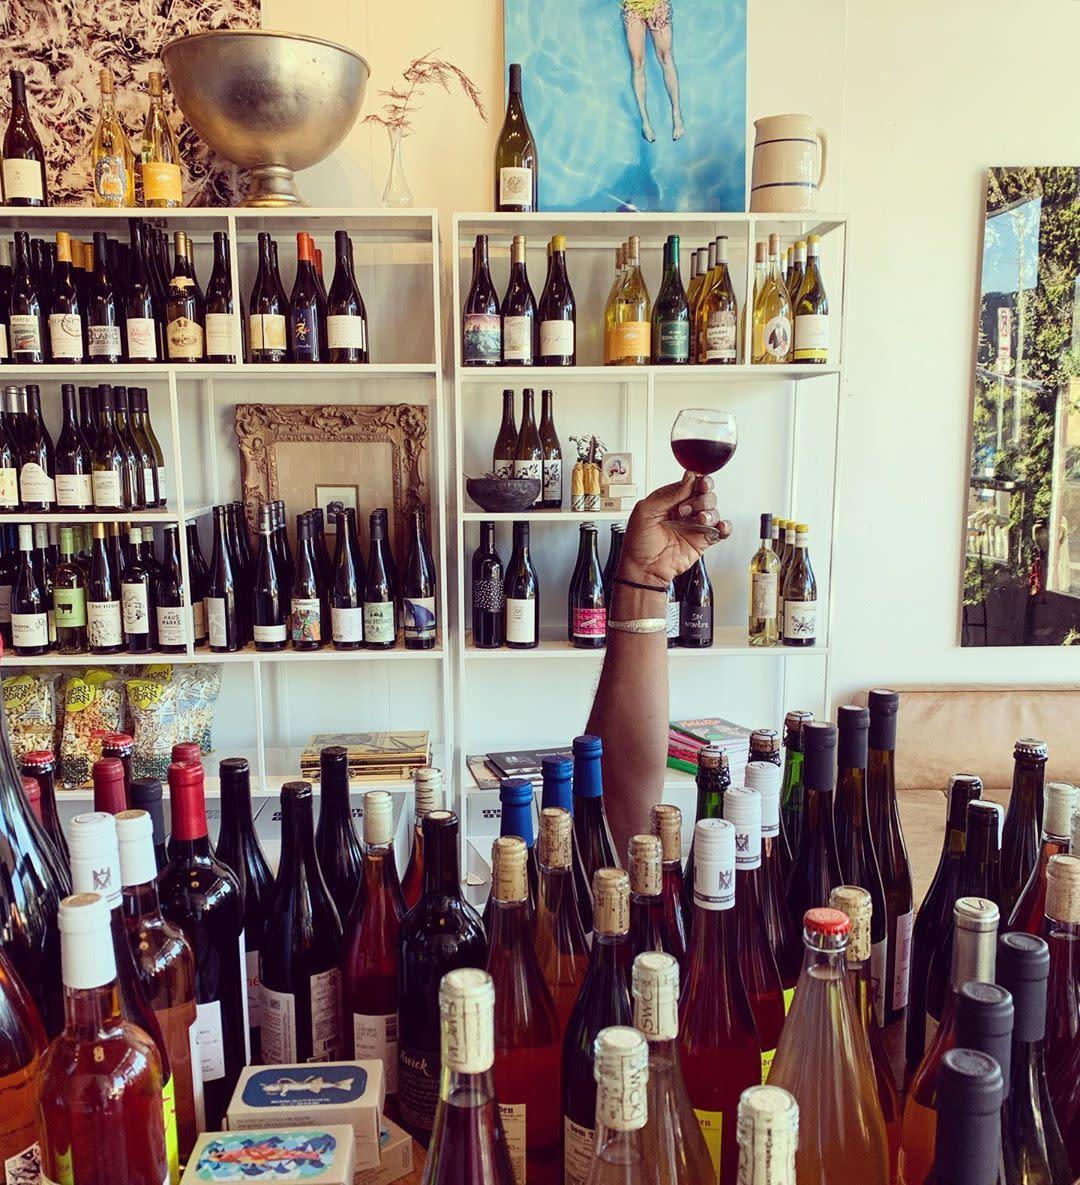 Wild CHild Wines